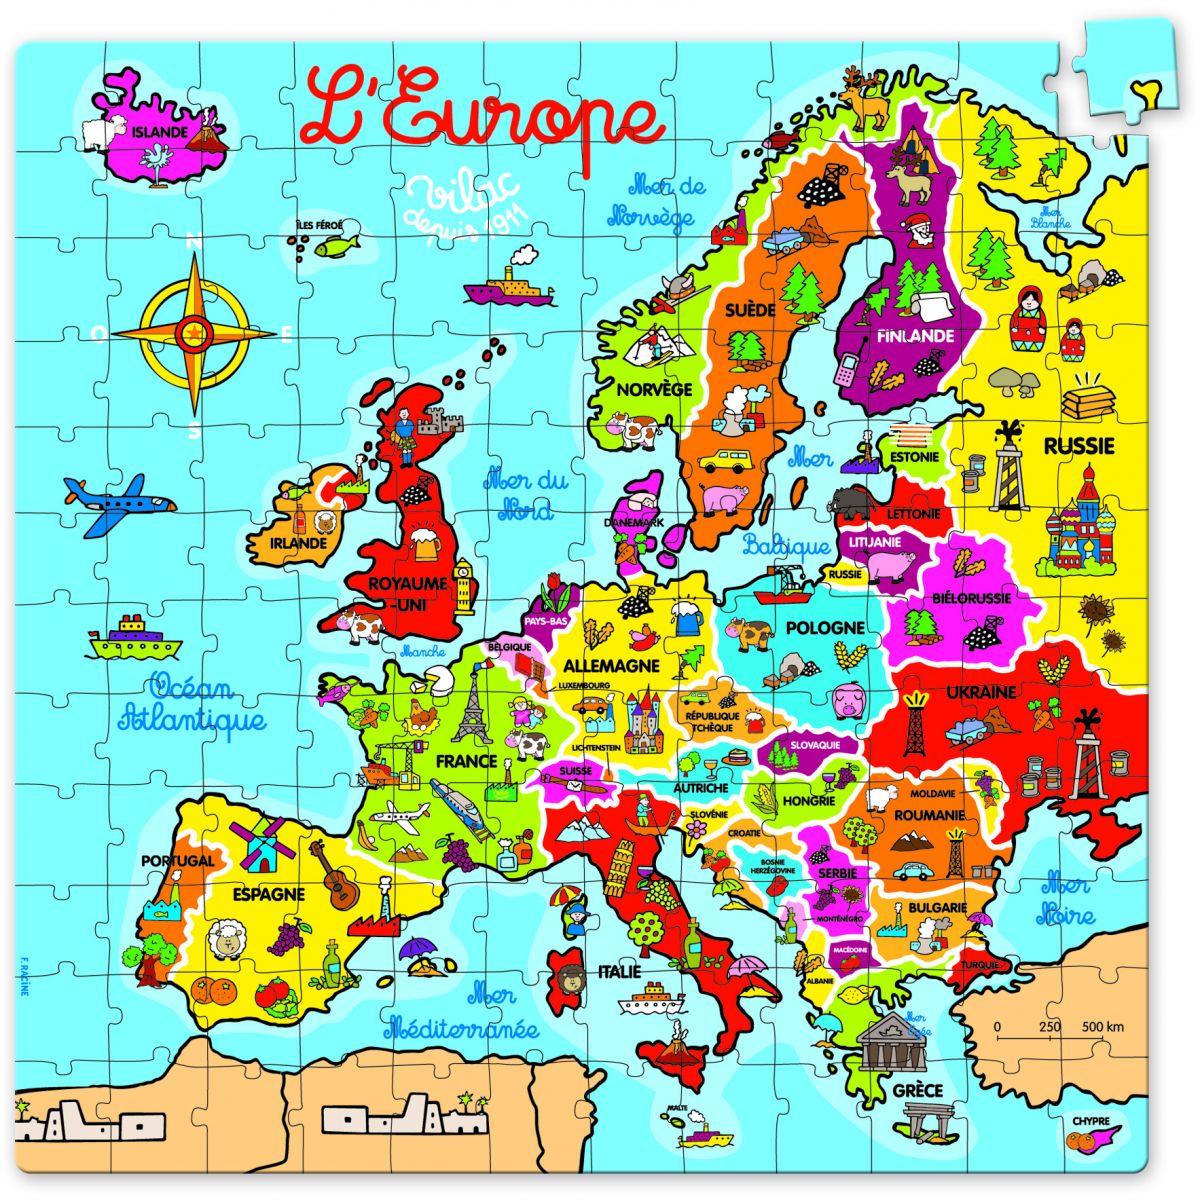 Carte Europe Janod.Puzzle Carte D Europe En Valise En Carton A Partir De 6 Ans Sebio